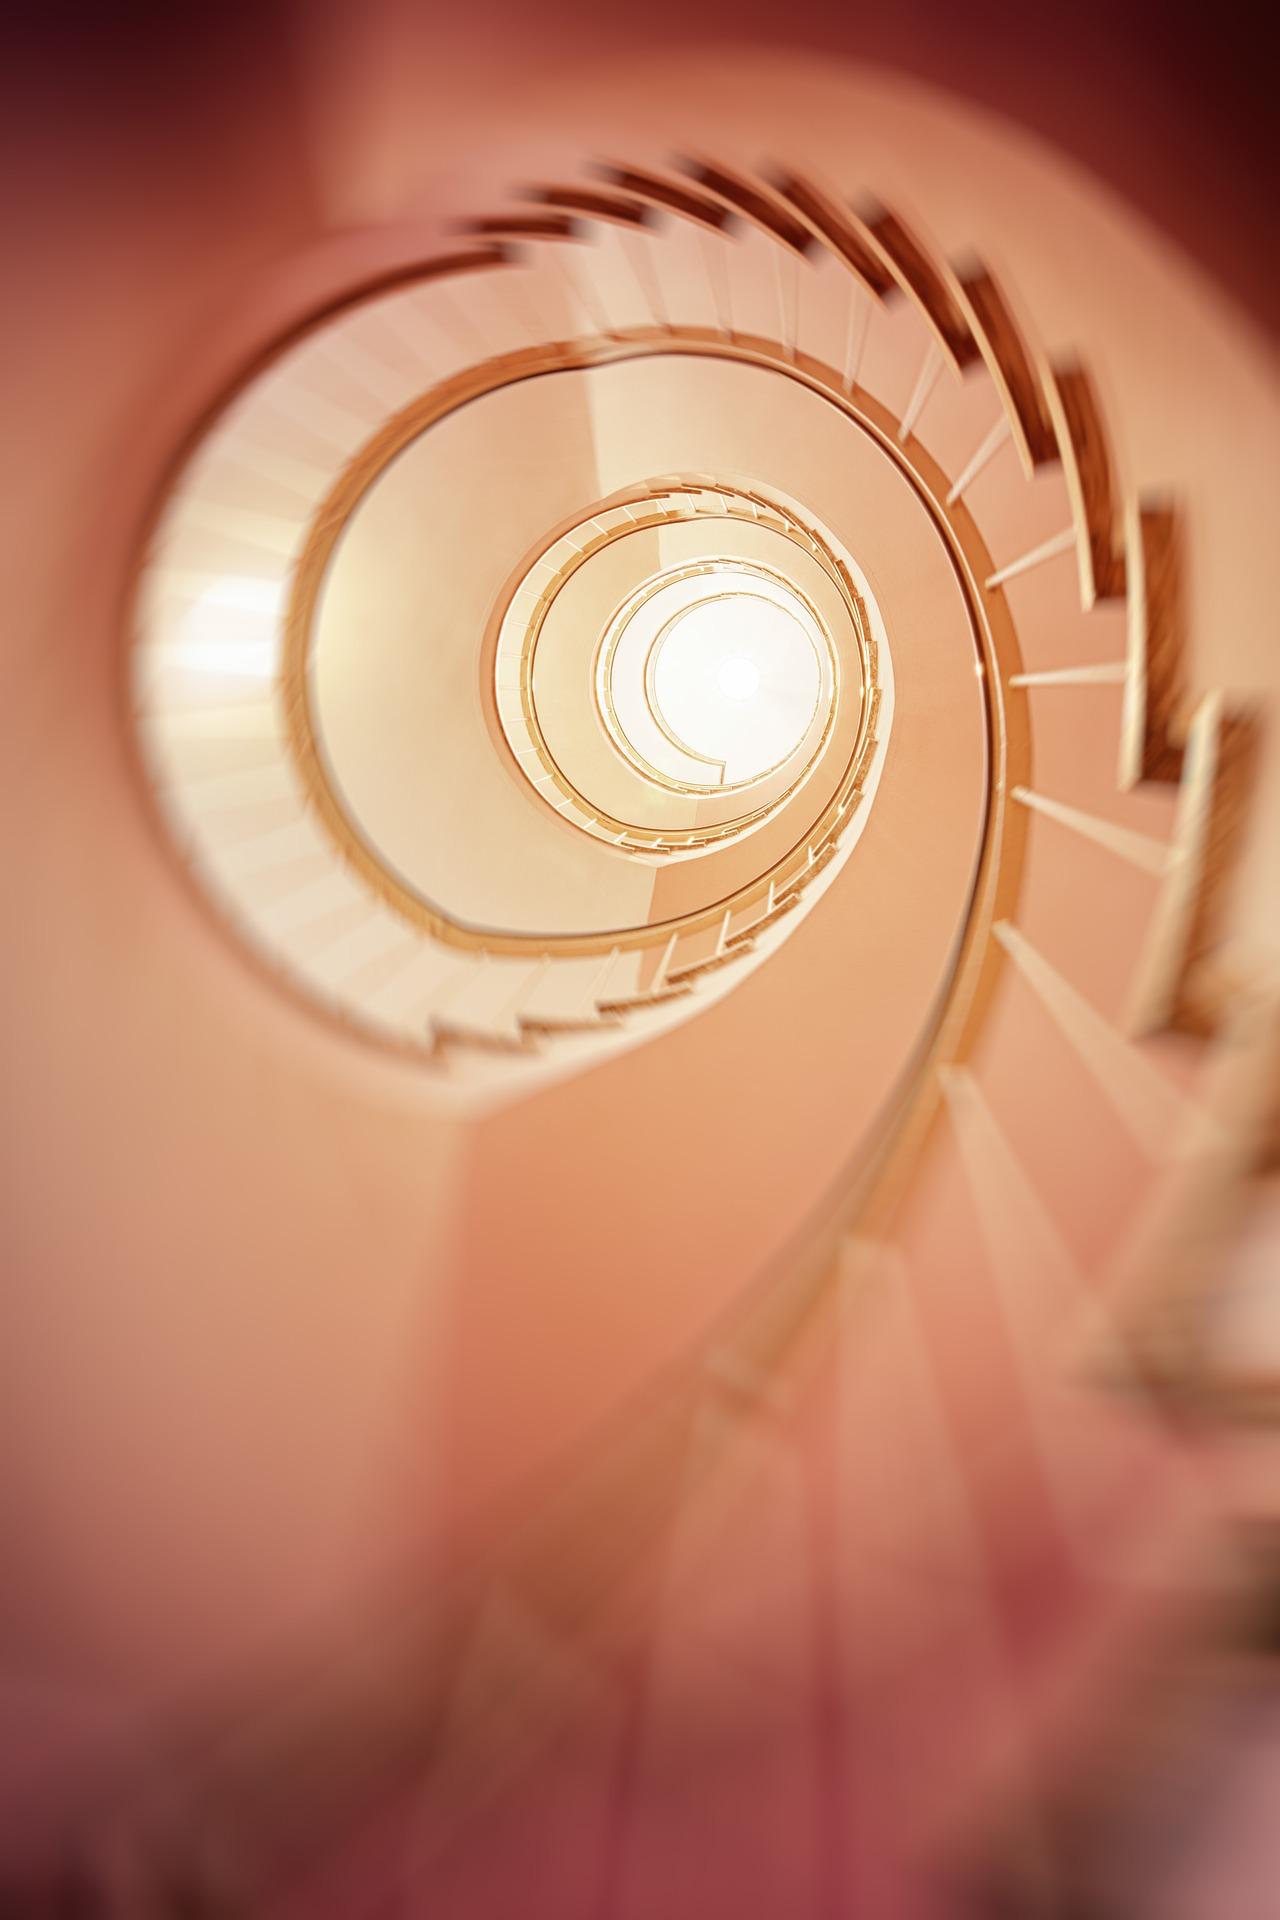 spiral-staircase-3401730_1920.jpg